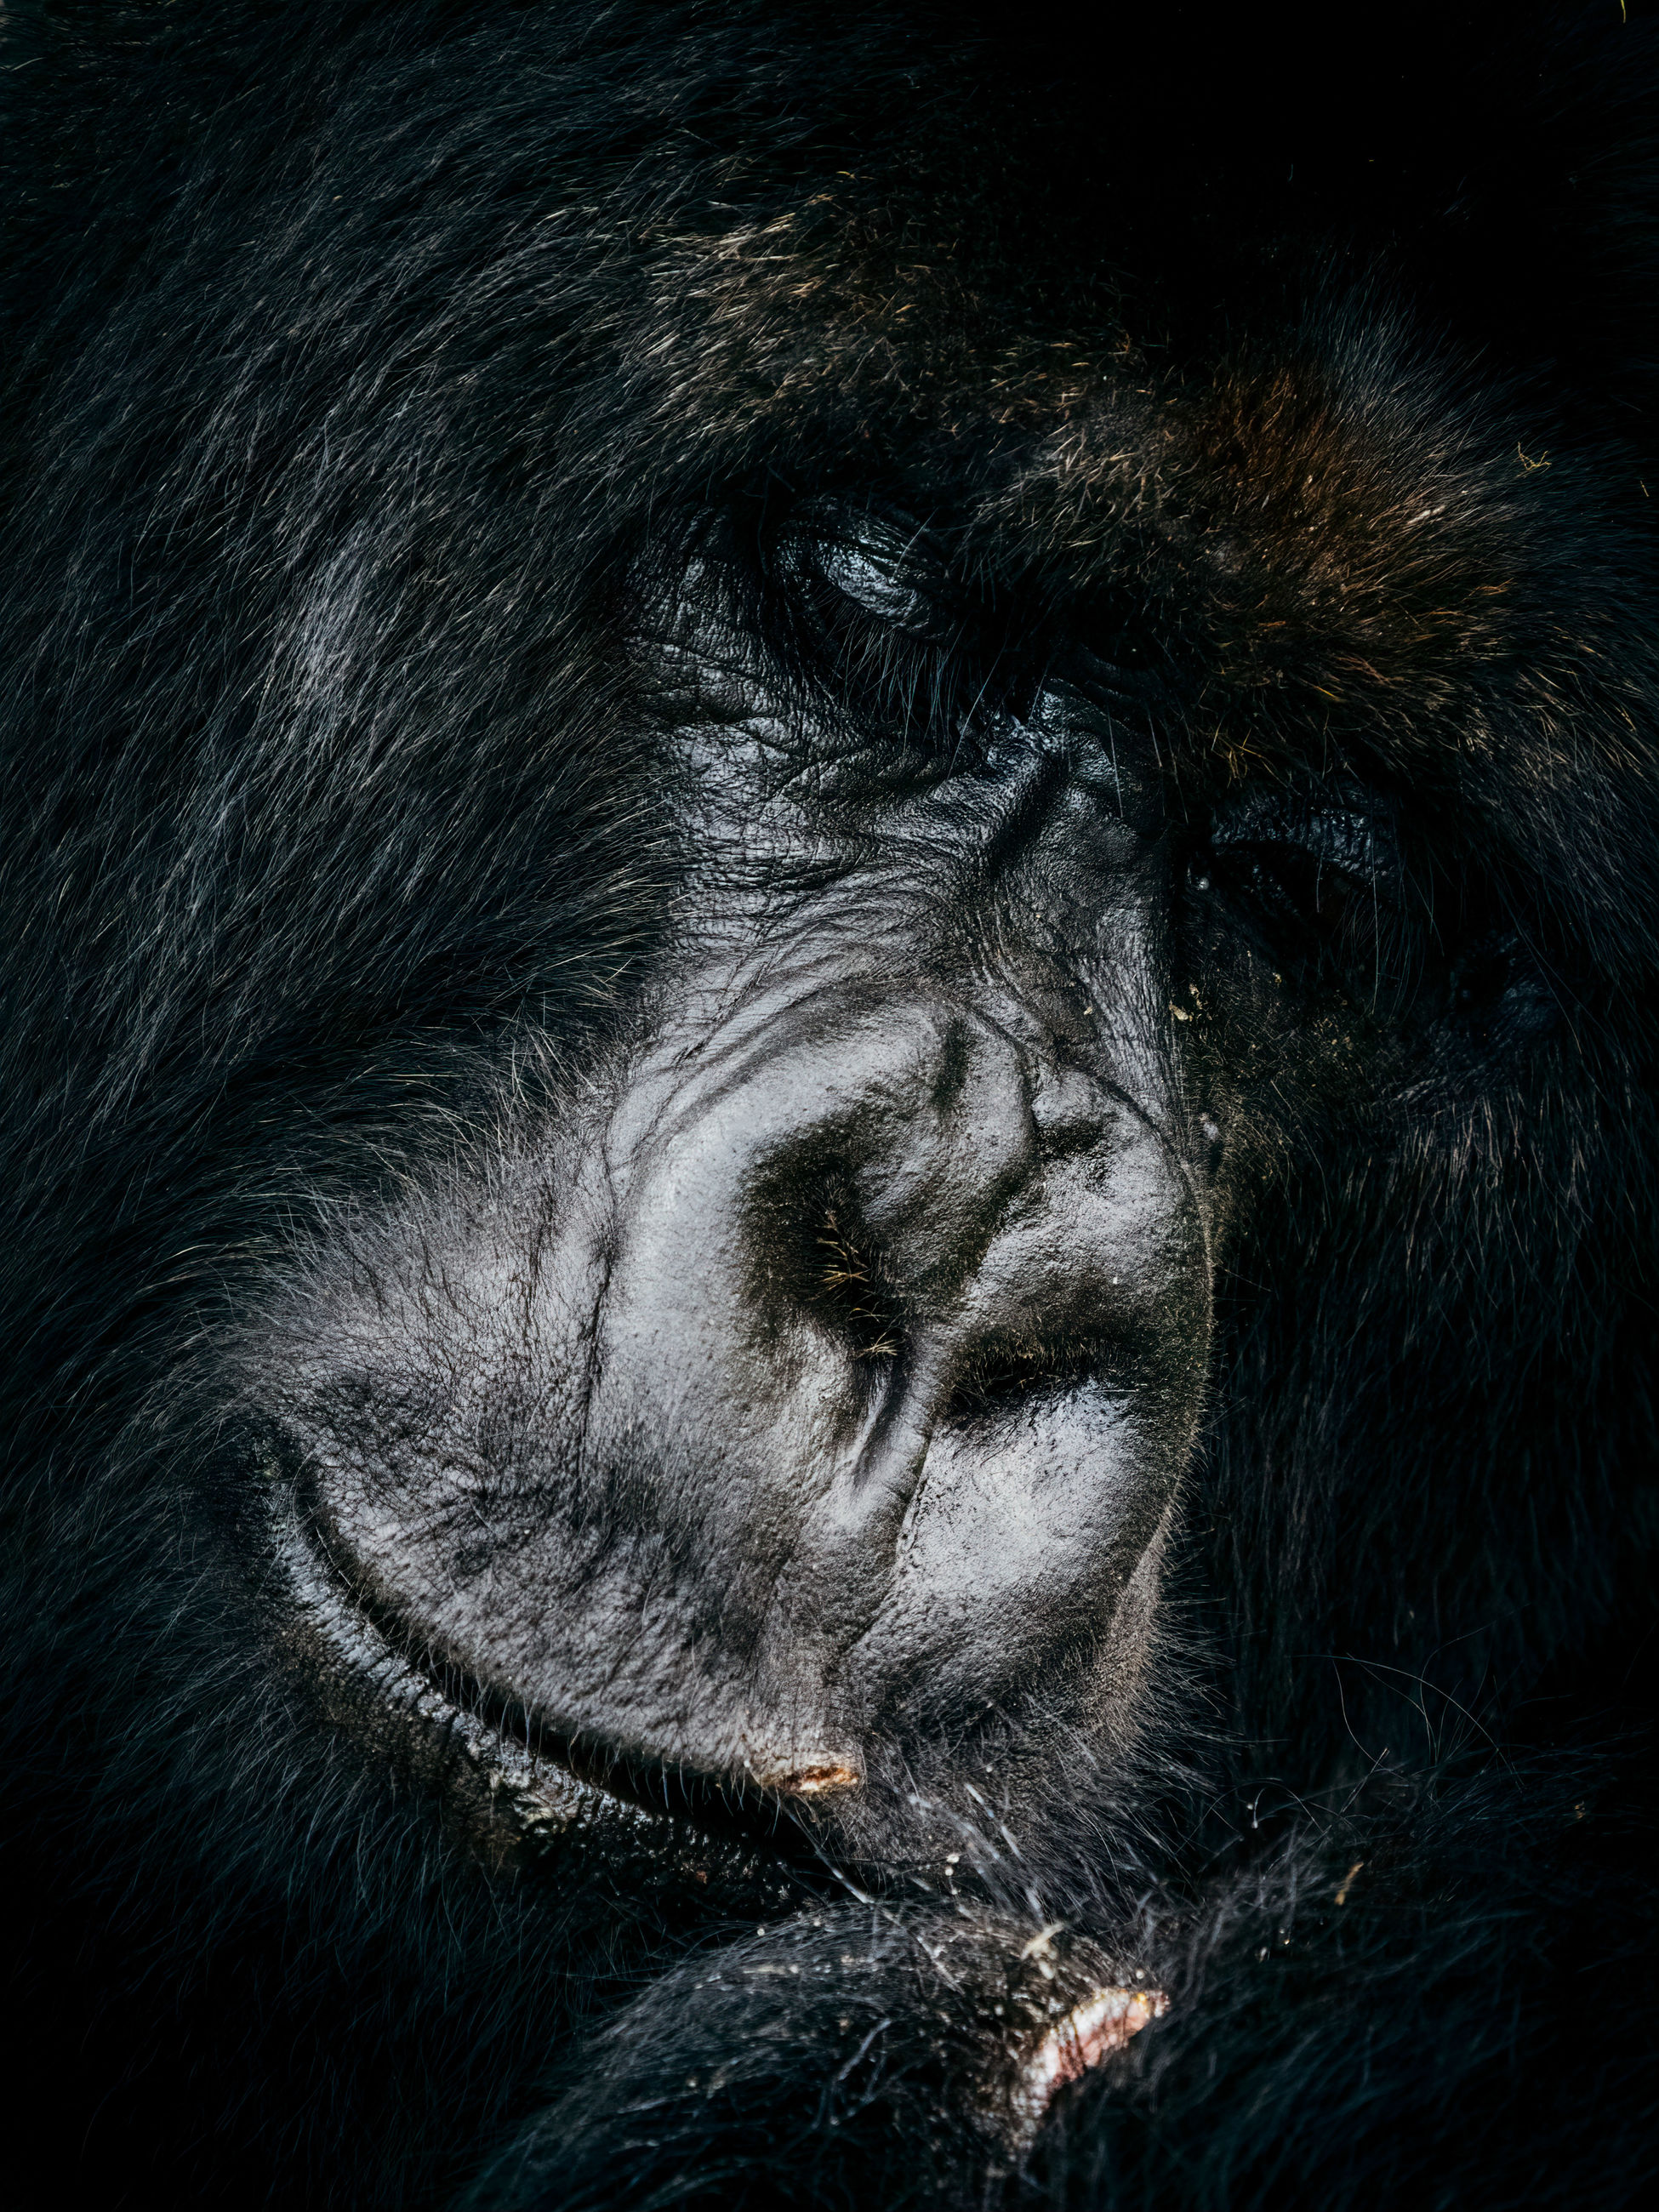 mammal, animal themes, animal, animal wildlife, one animal, animals in the wild, primate, monkey, close-up, no people, ape, animal body part, animal head, vertebrate, gorilla, endangered species, day, portrait, animal hair, hair